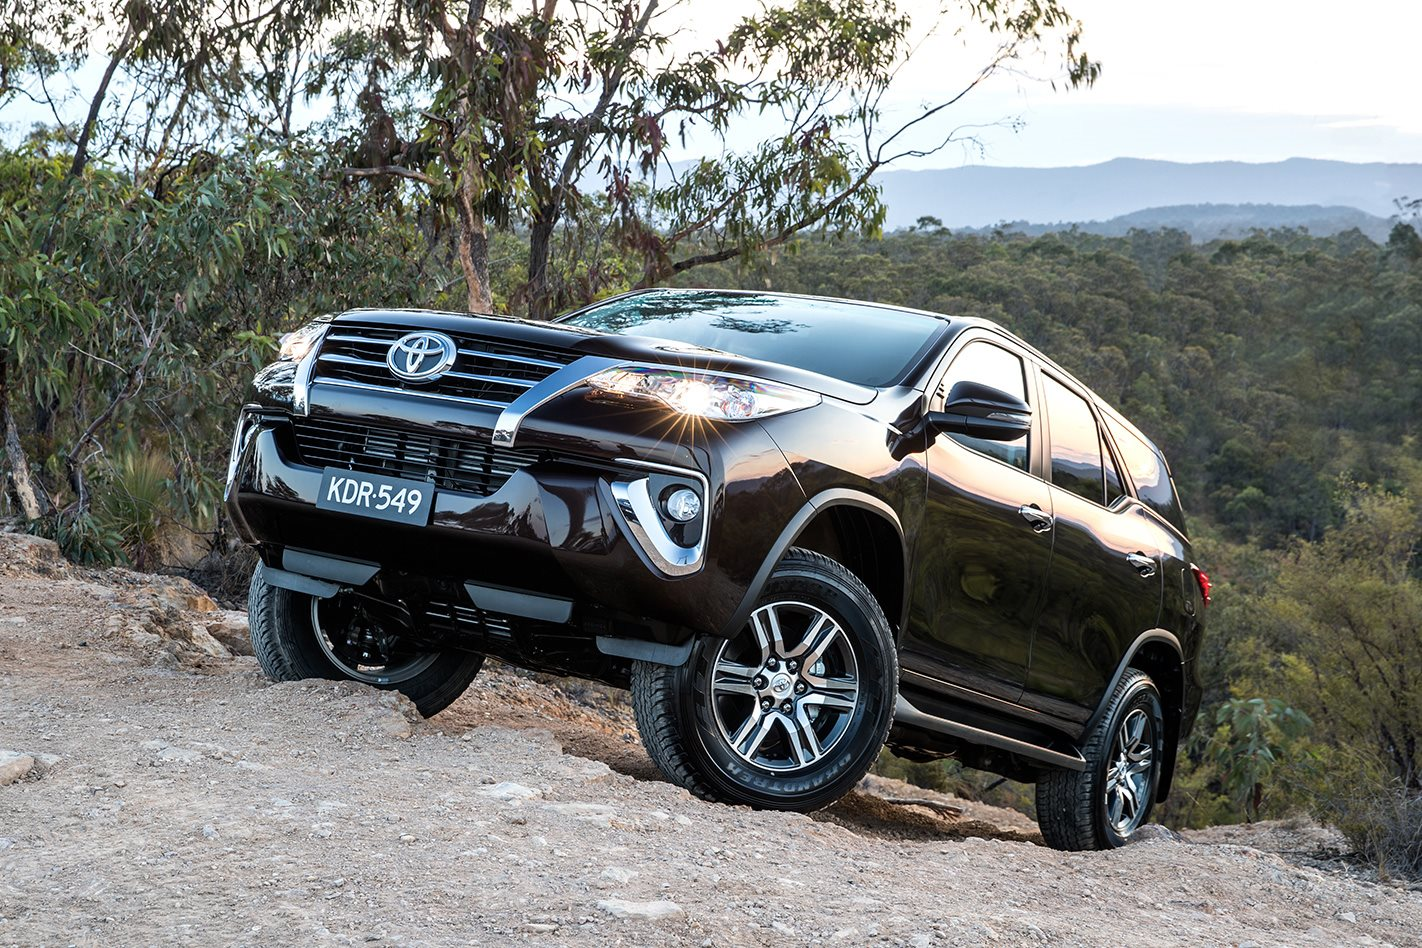 Toyota-Fortuner-hillclimb.jpg